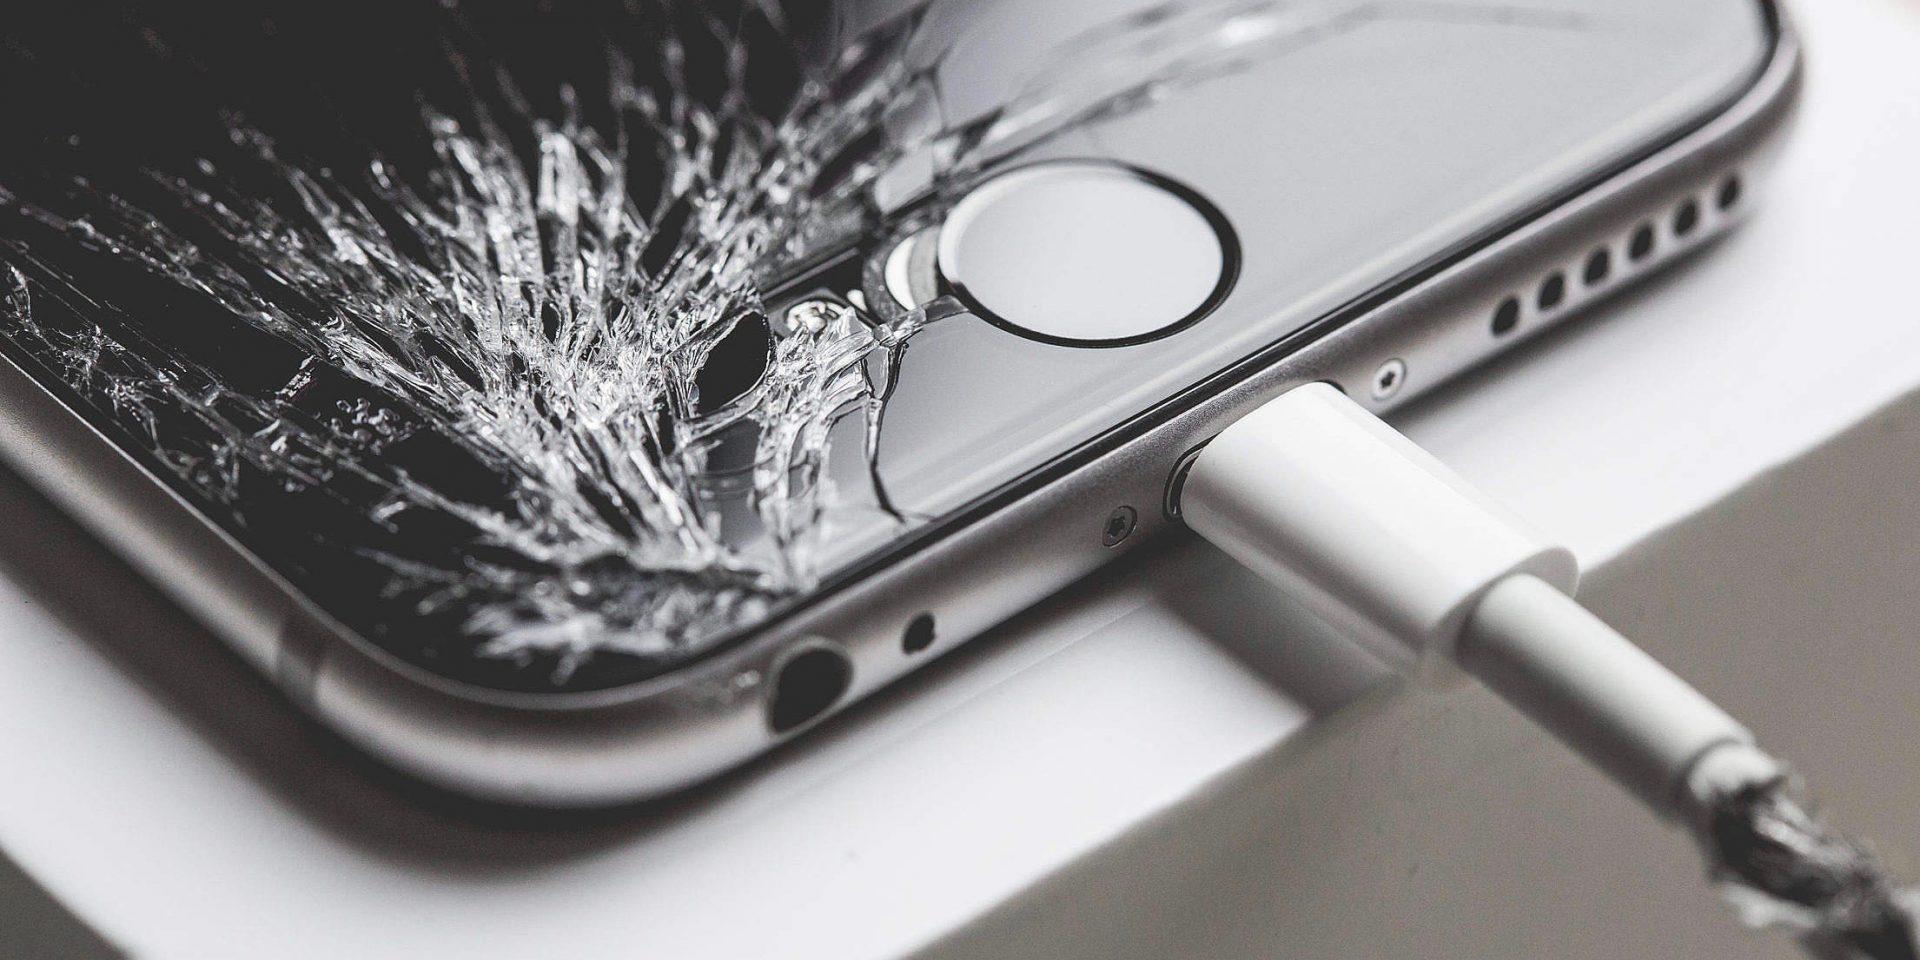 iPhone Ladebuchse Reparatur Düsseldorf